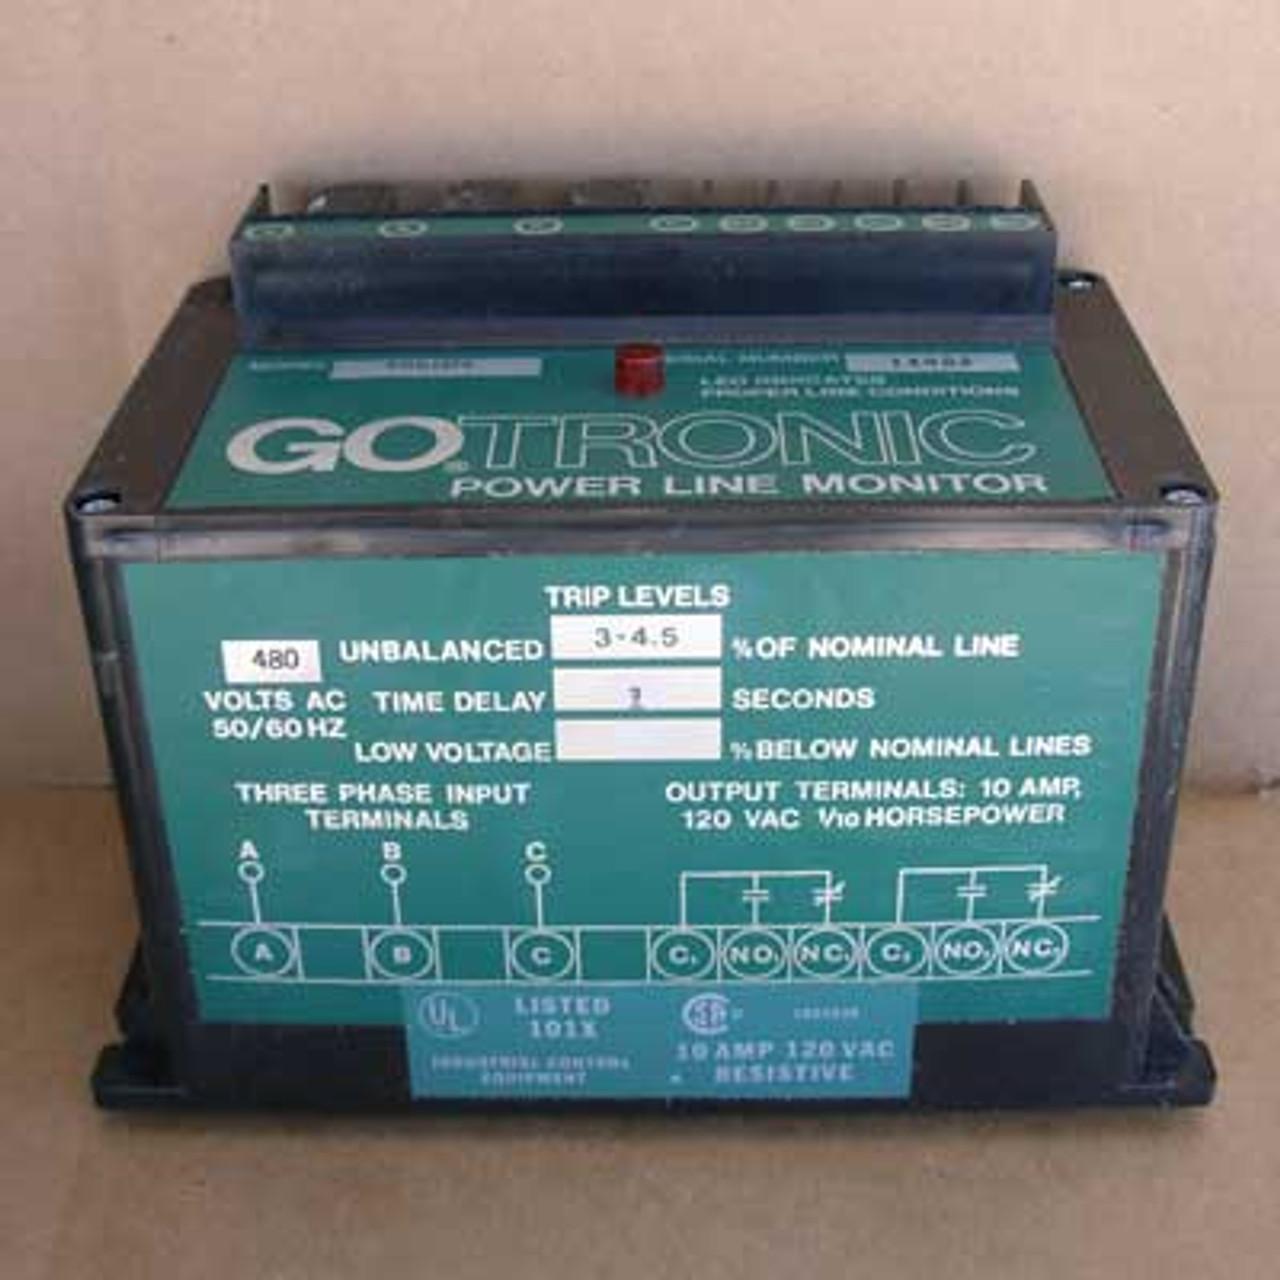 GOTRONIC #585109 Power Line Monitor 480V - New